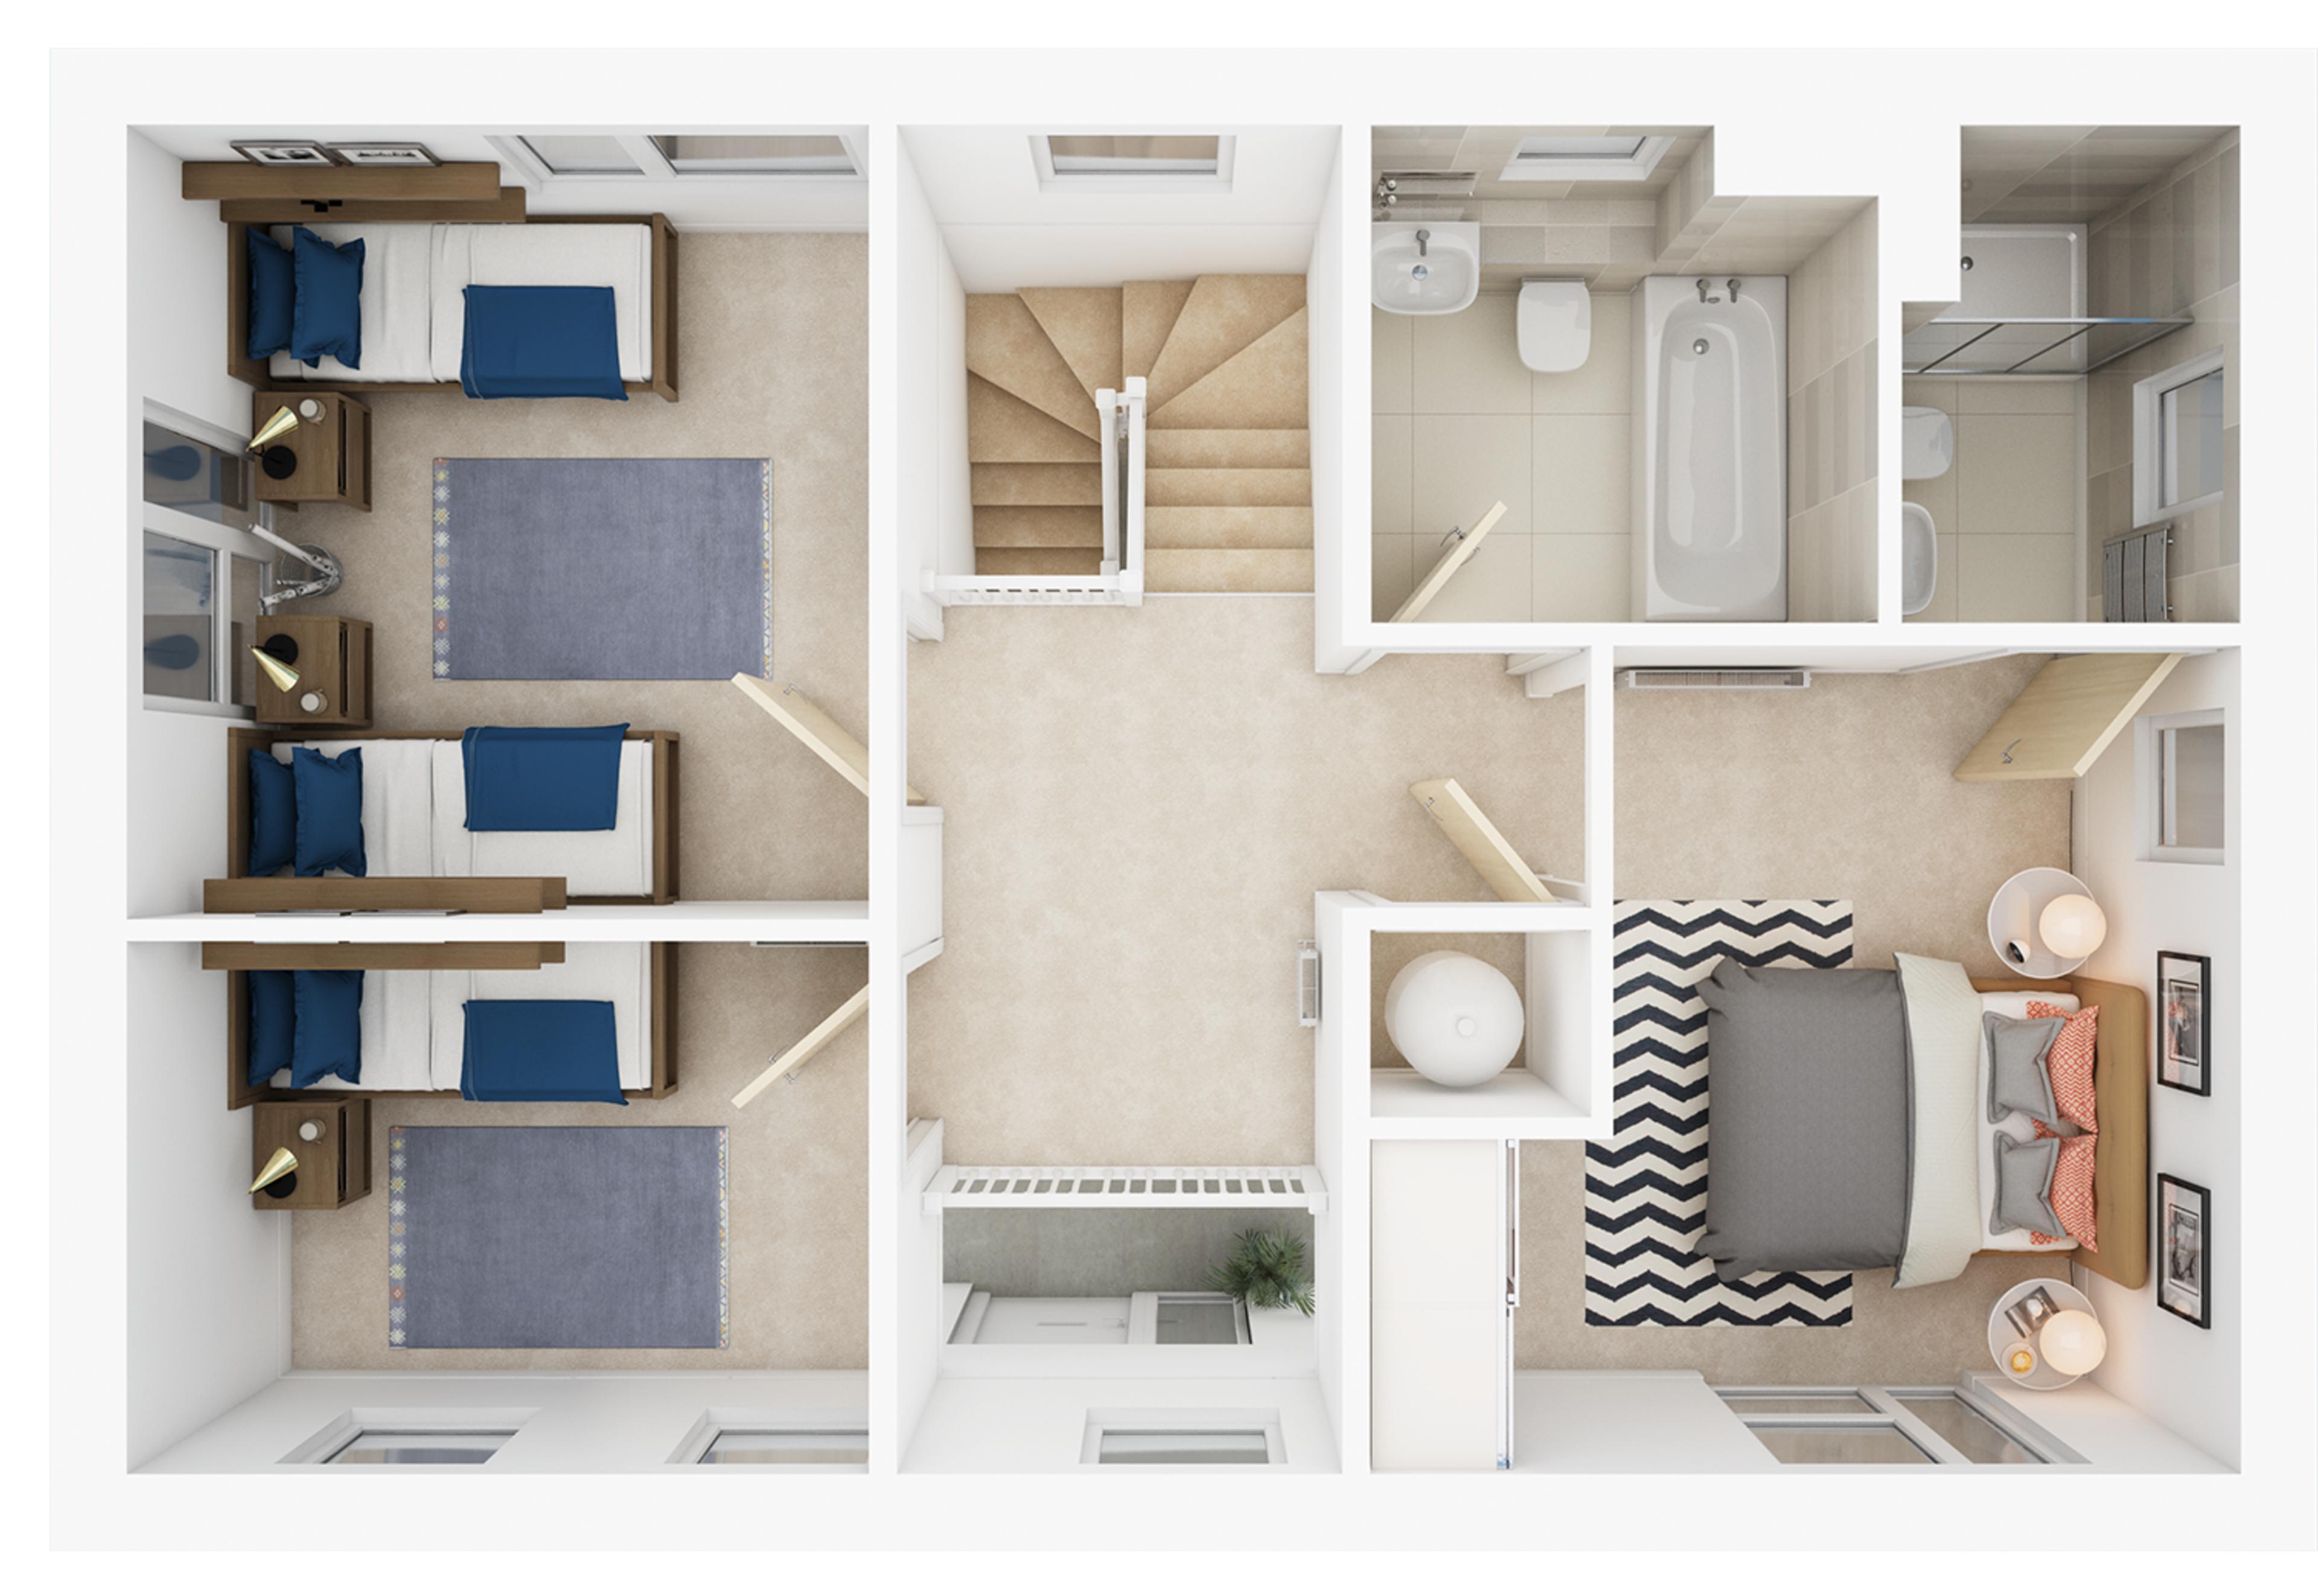 Watling Grange > Bretton > First floor